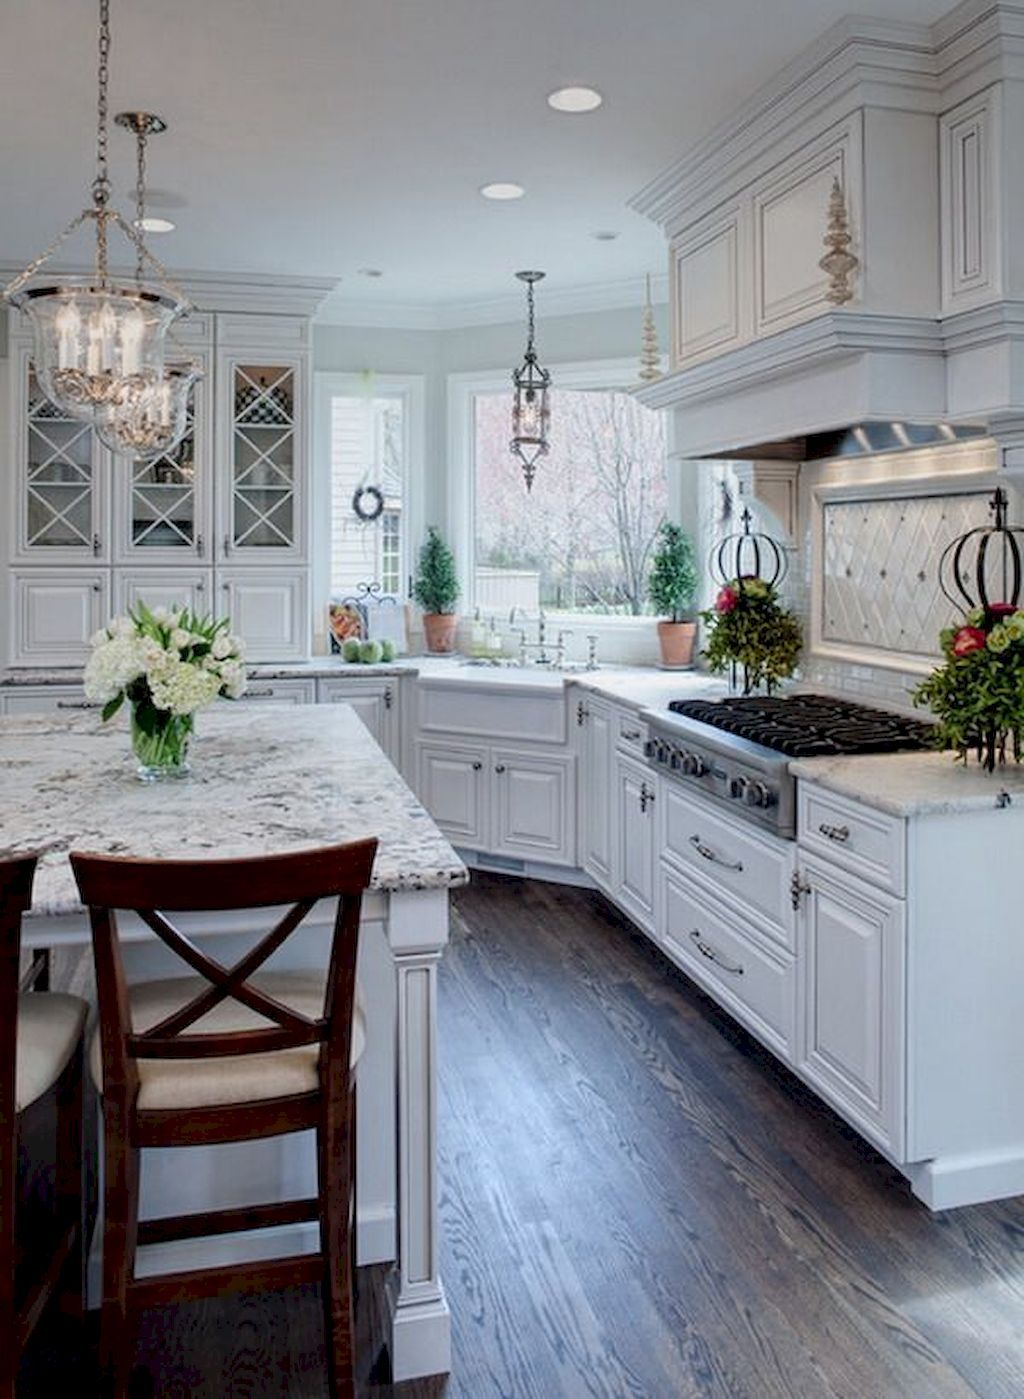 Best 100 White Kitchen Cabinets Decor Ideas For Farmhouse Style Design